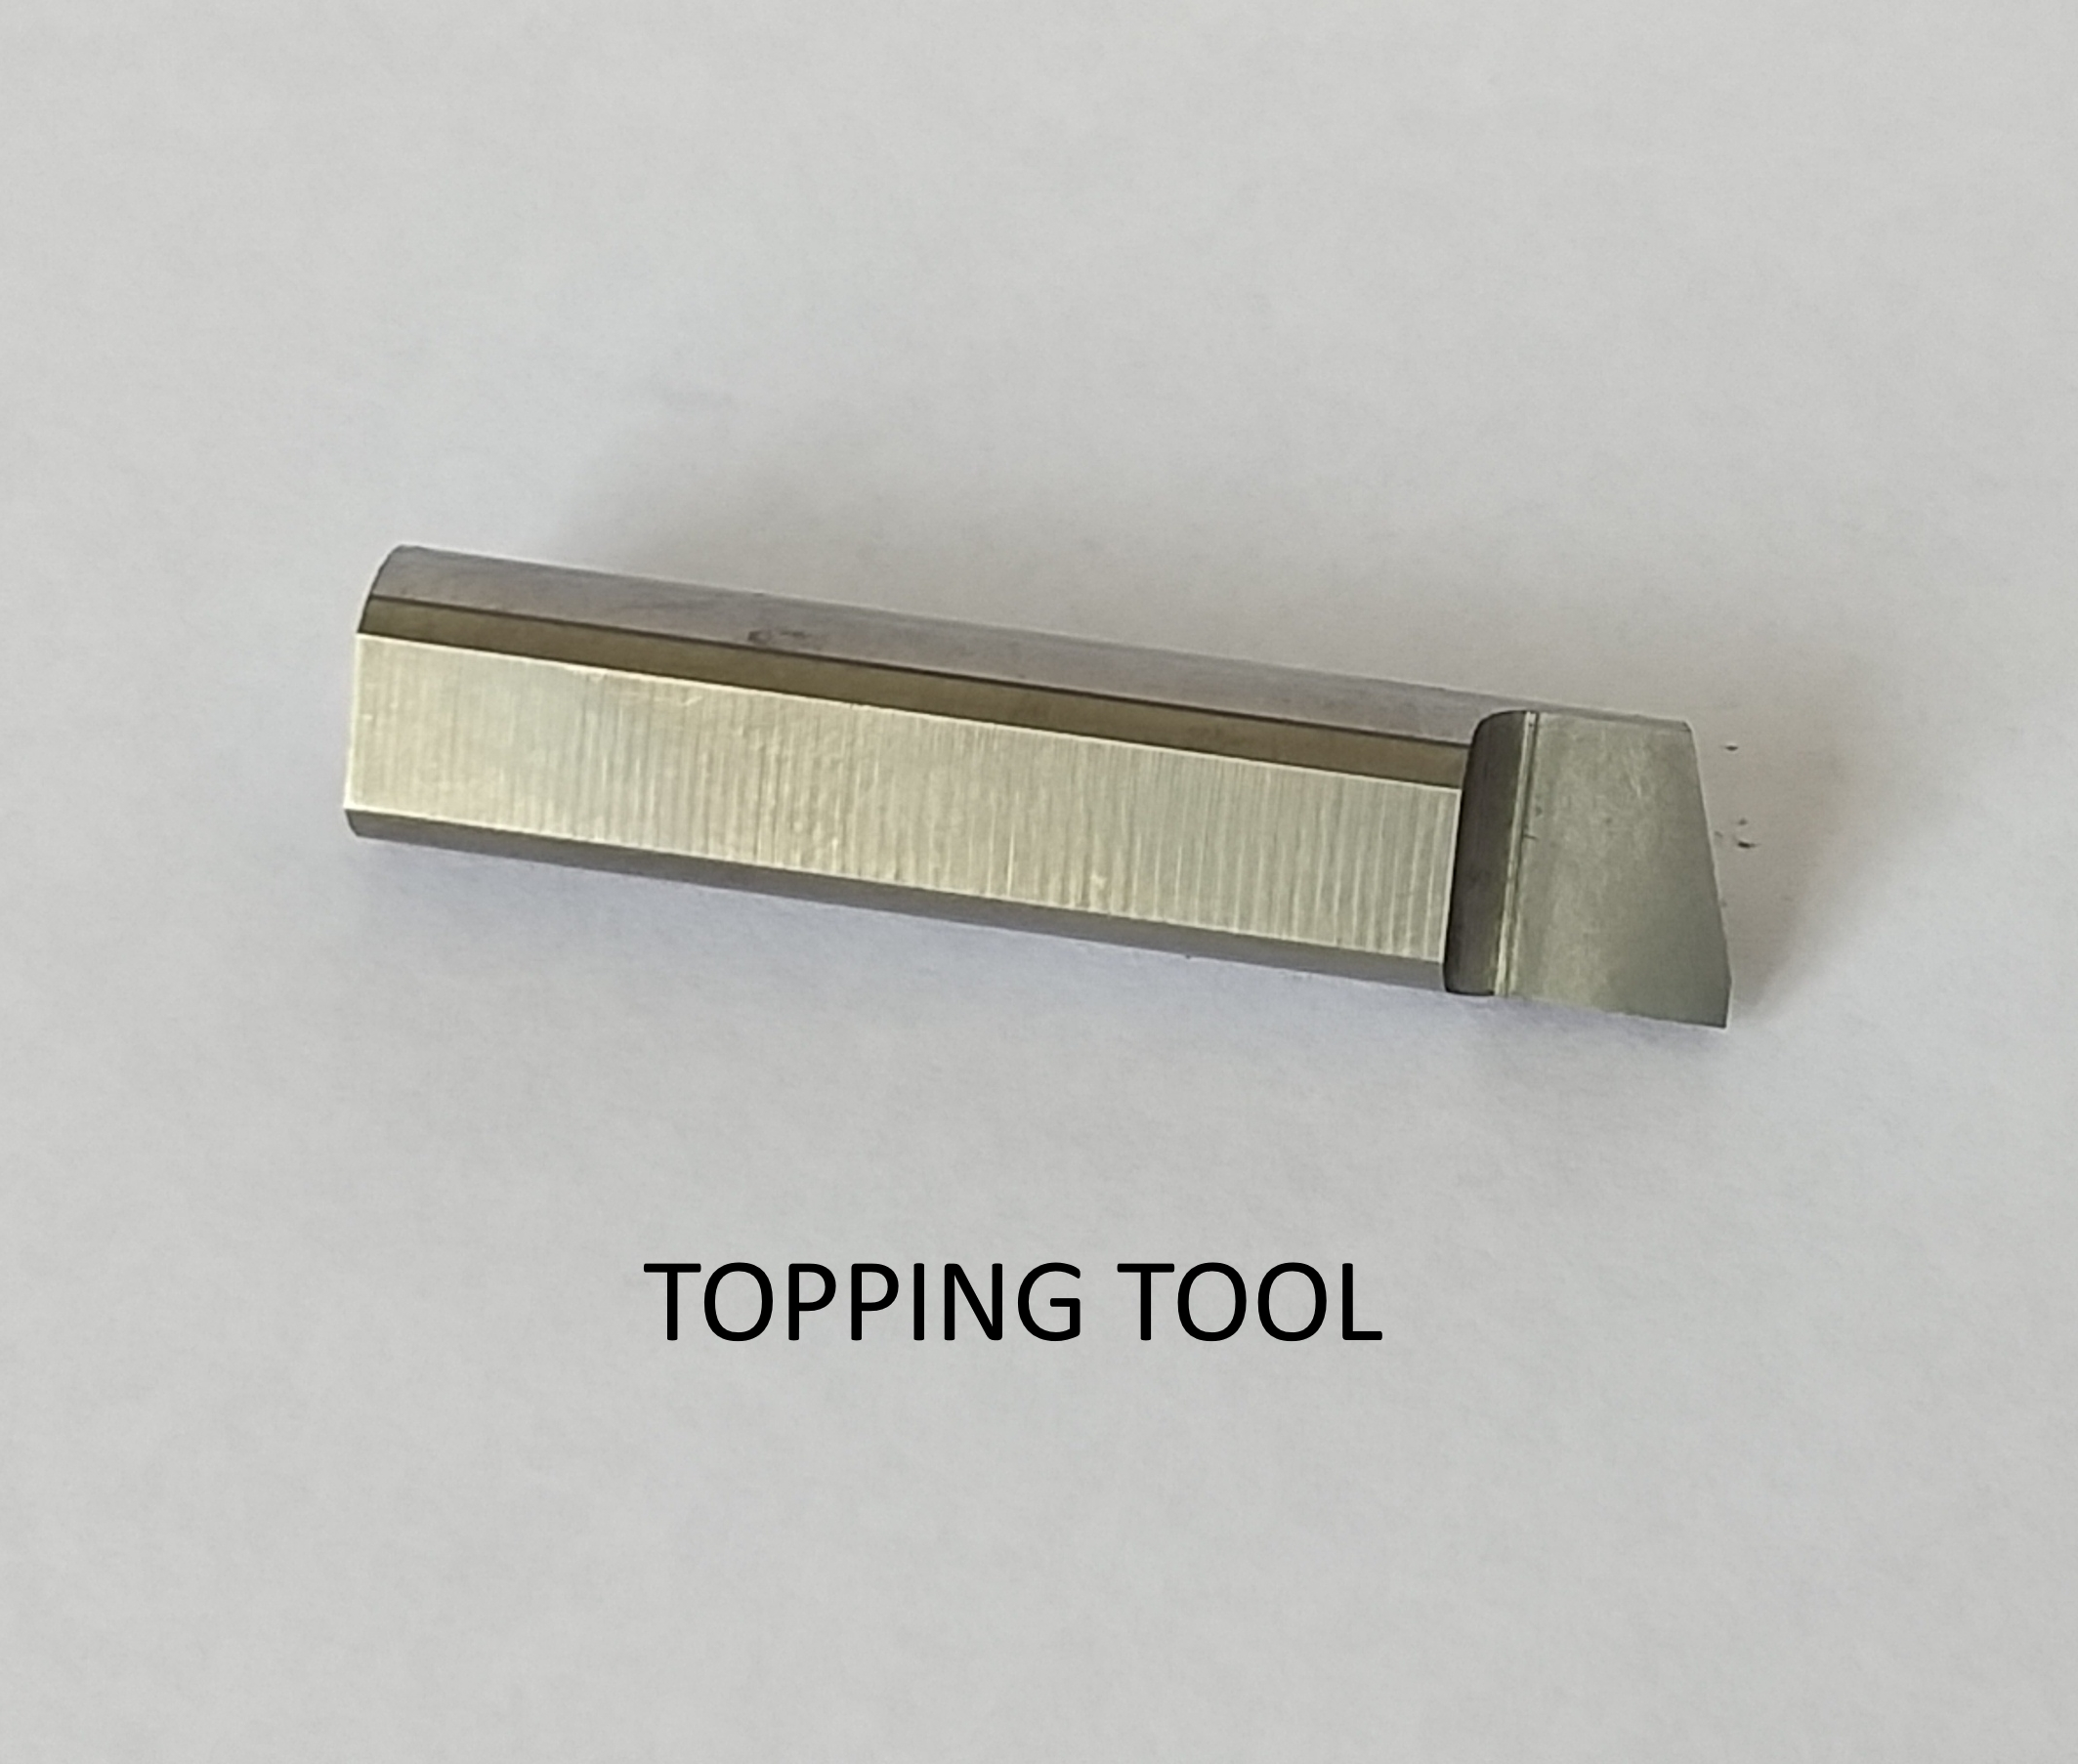 Topping Tool1.jpg